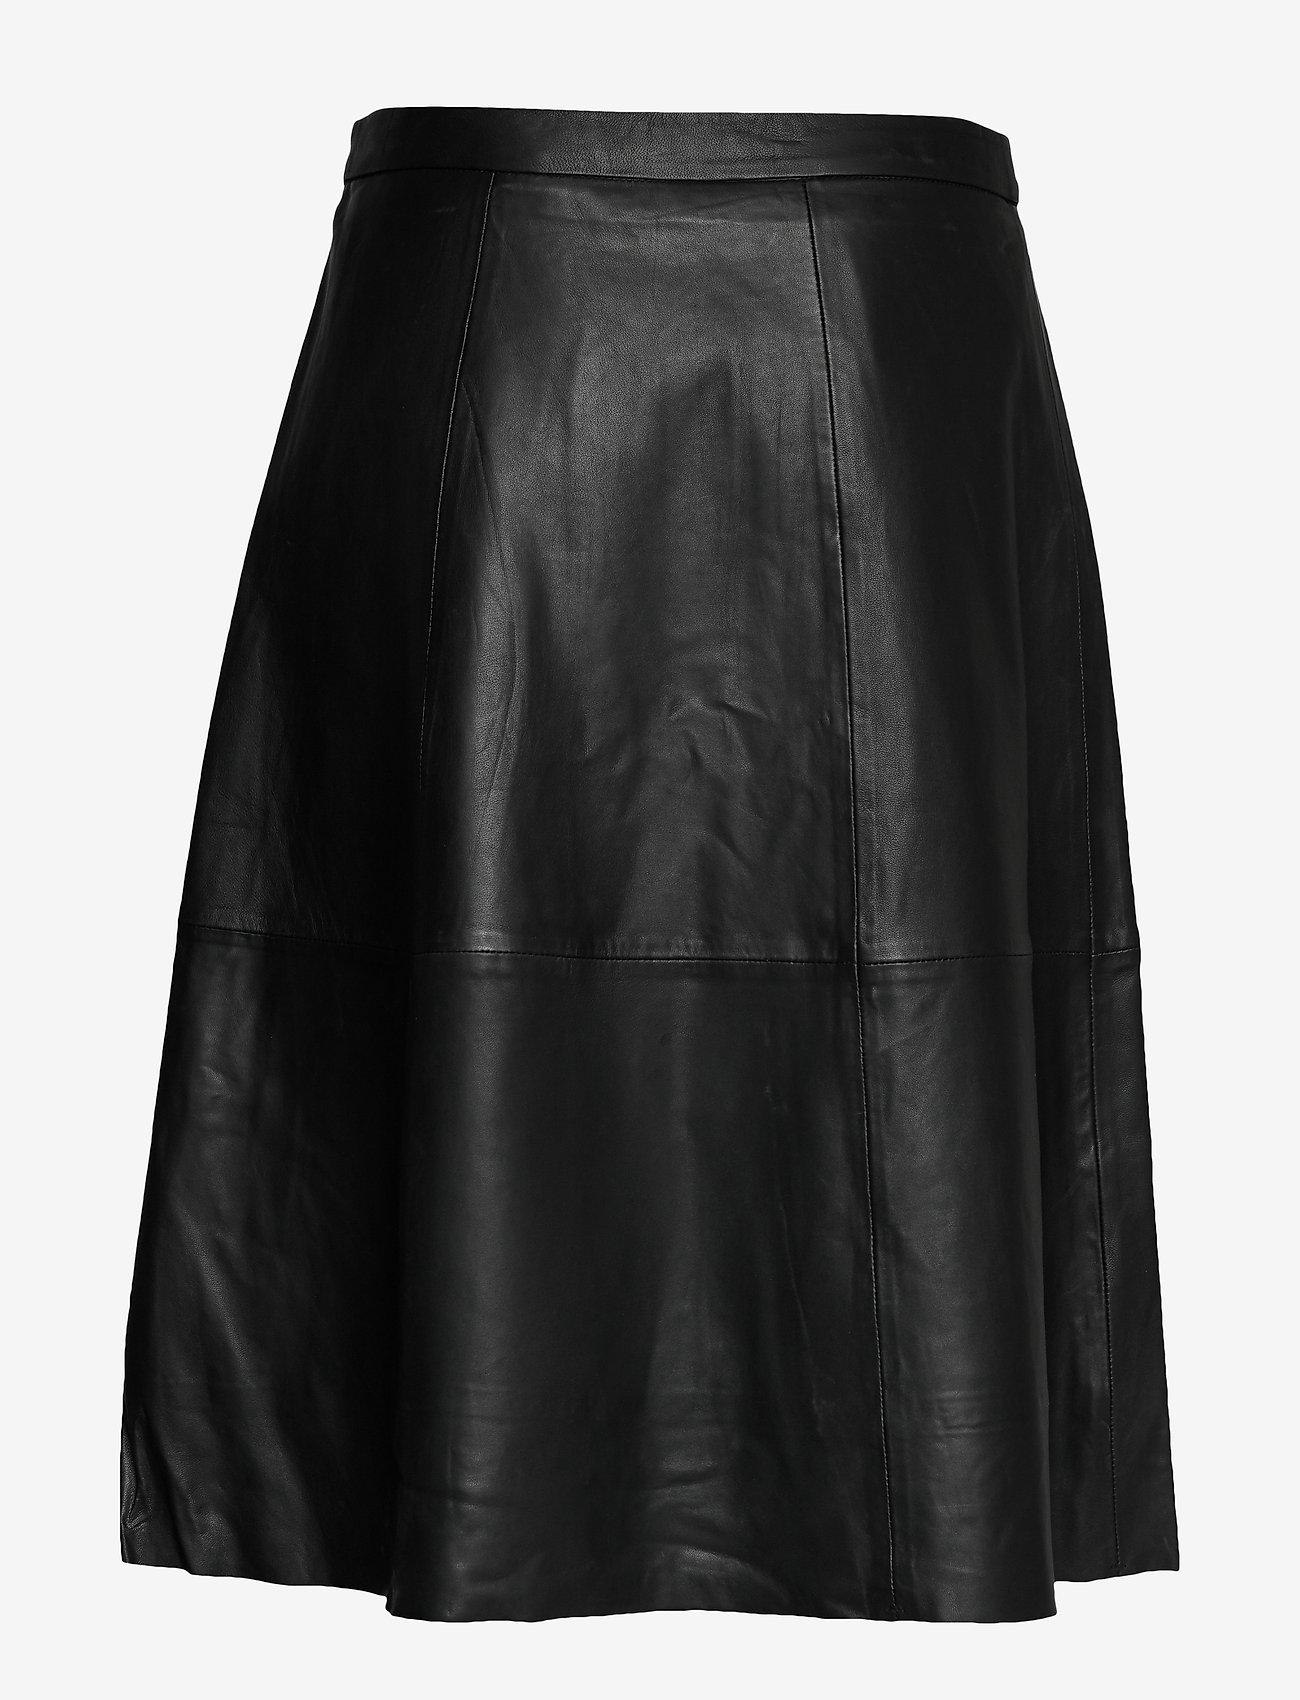 Simonecr Leather Skirt (Pitch Black) - Cream fzAEbZ